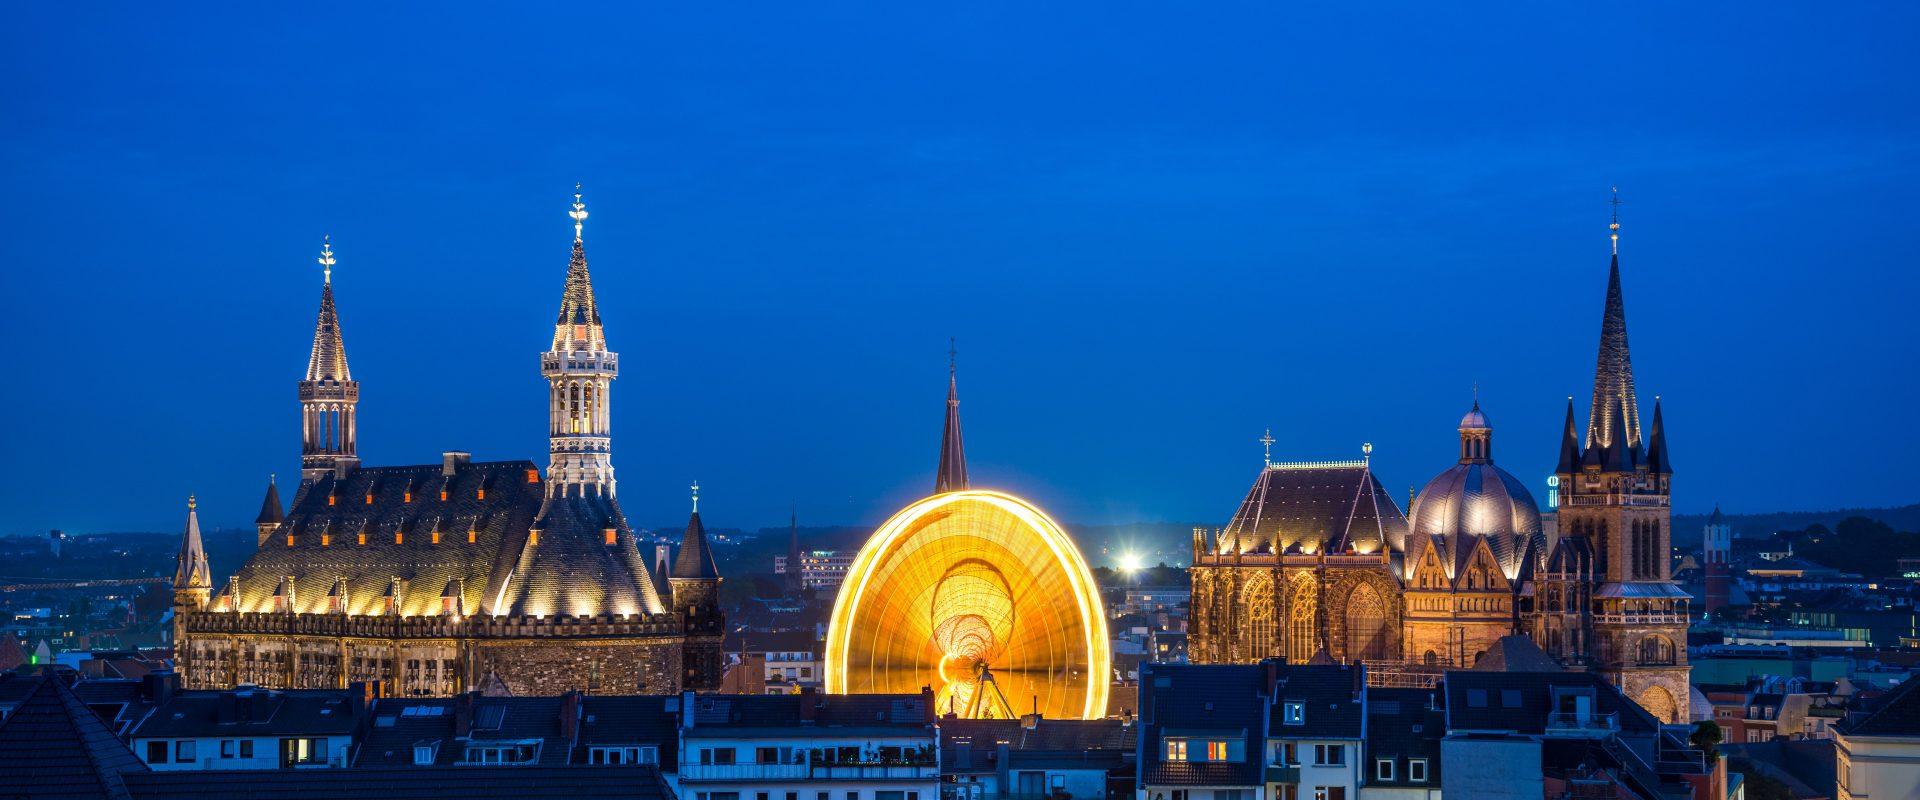 Permalink to: Aachen